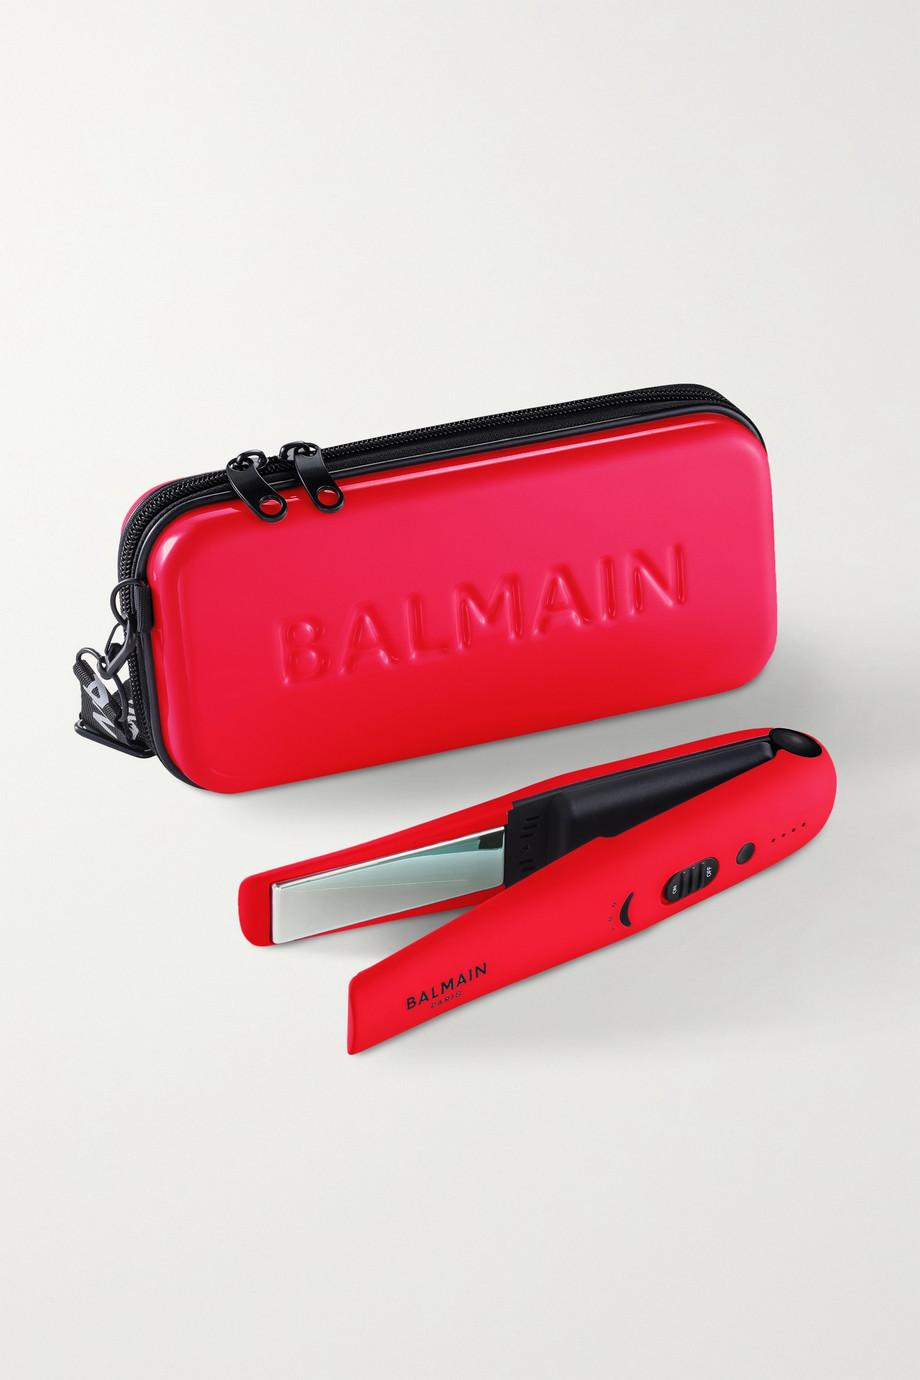 Balmain Paris Hair Couture Cordless Straightener